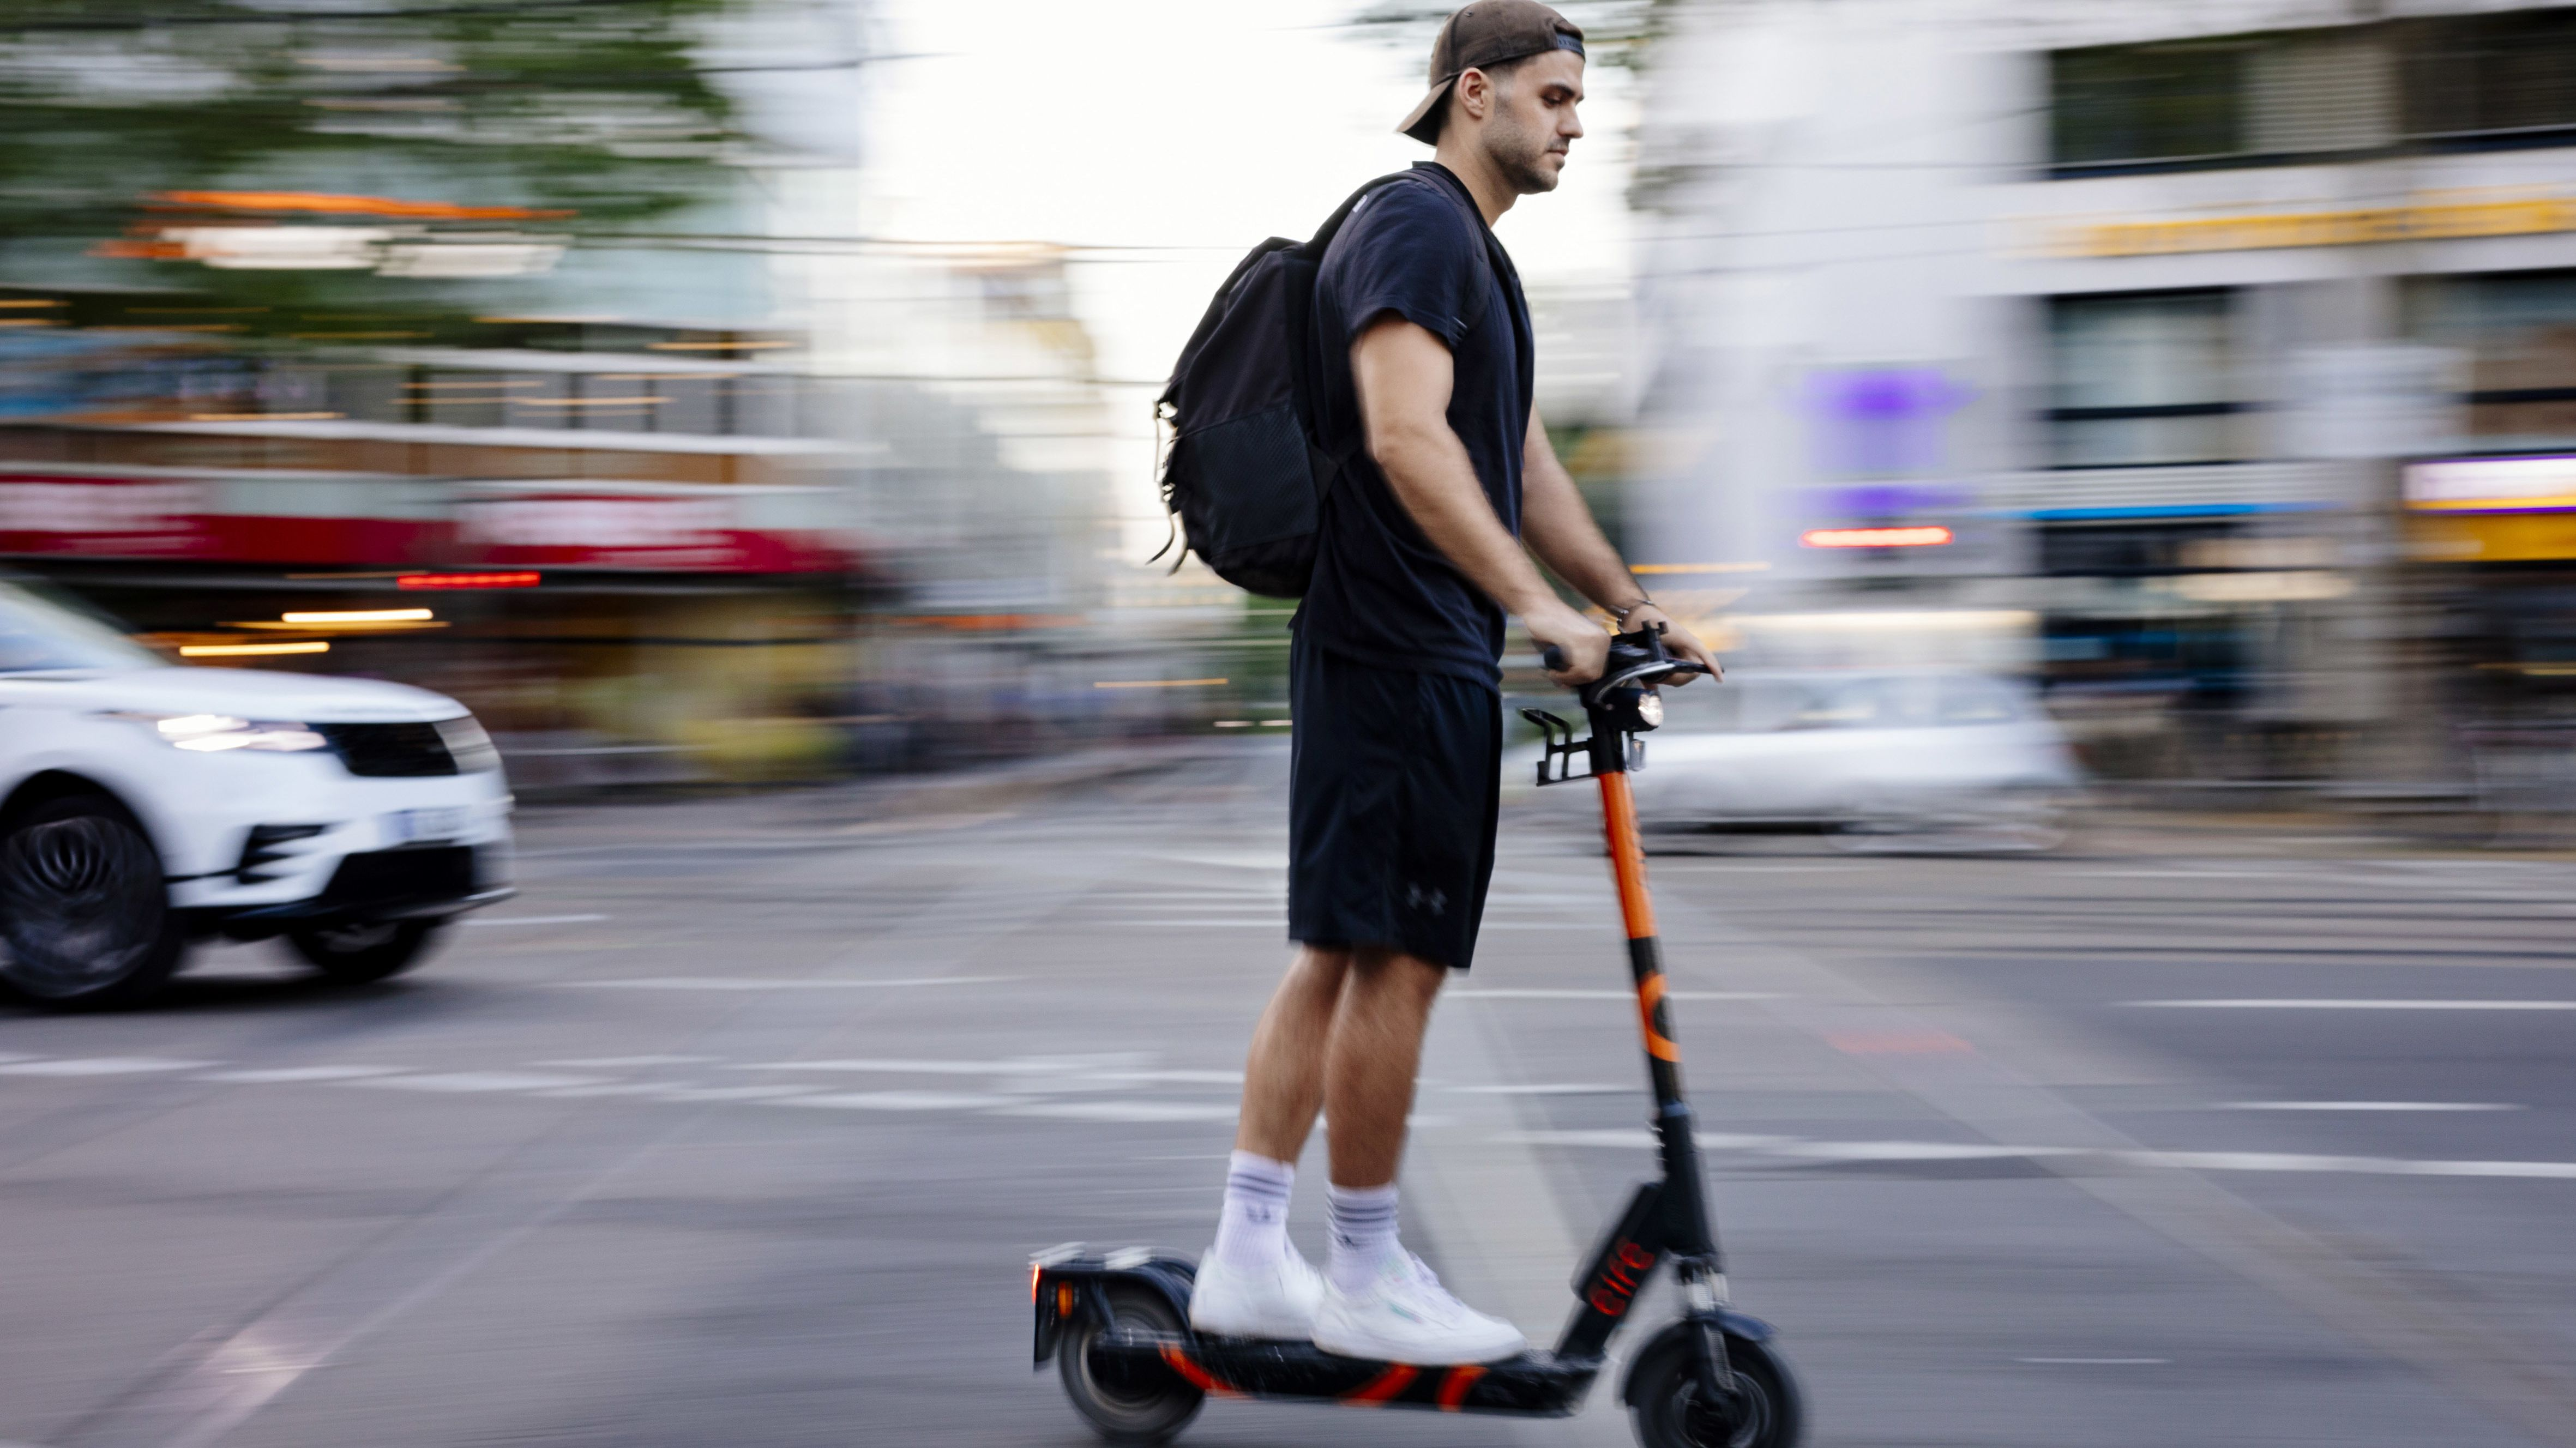 Archivbild: E-Scooter fährt durch Köln